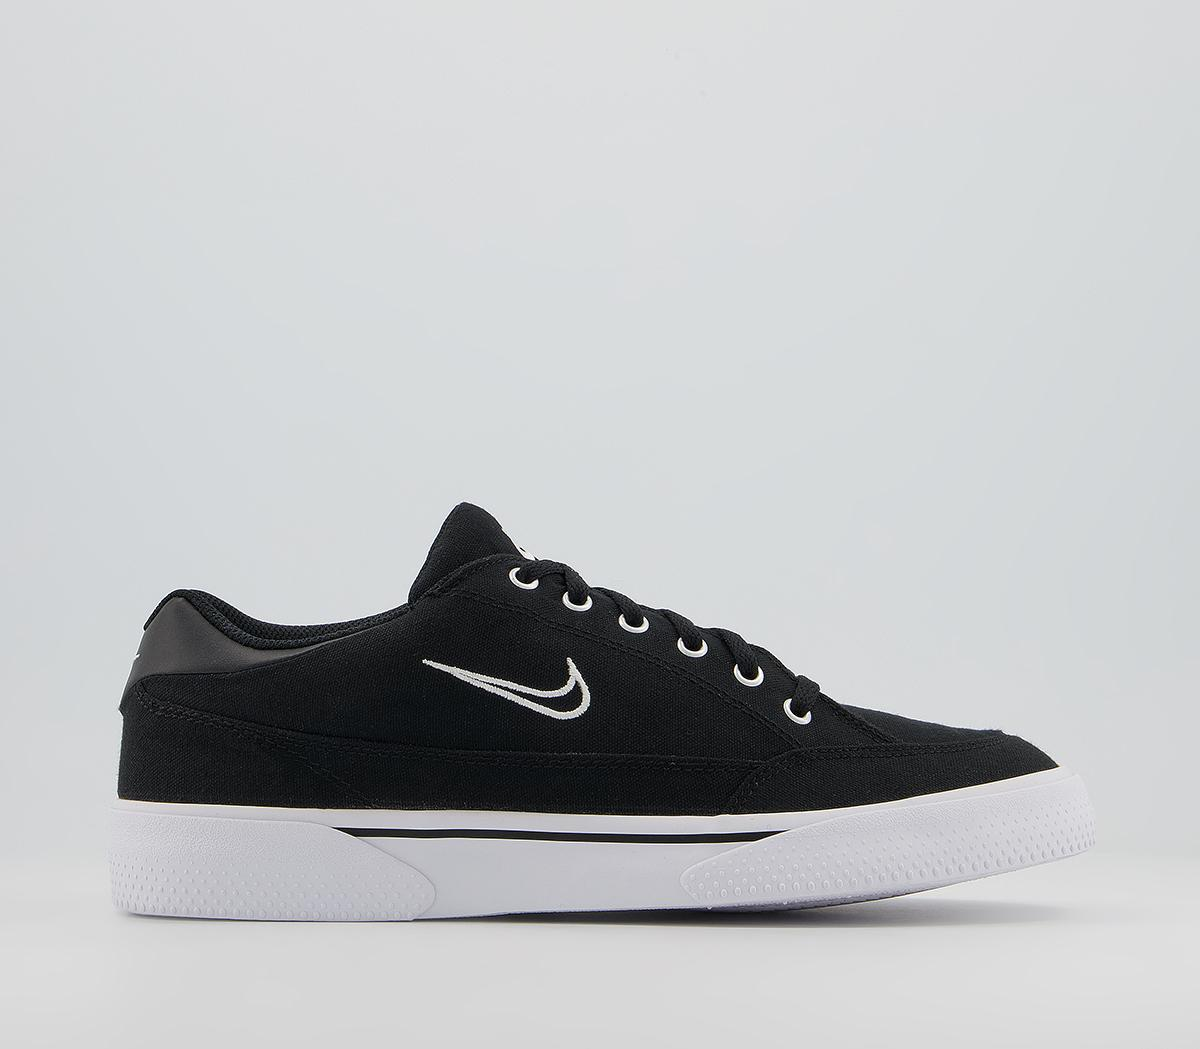 Nike Gts 97 Trainers